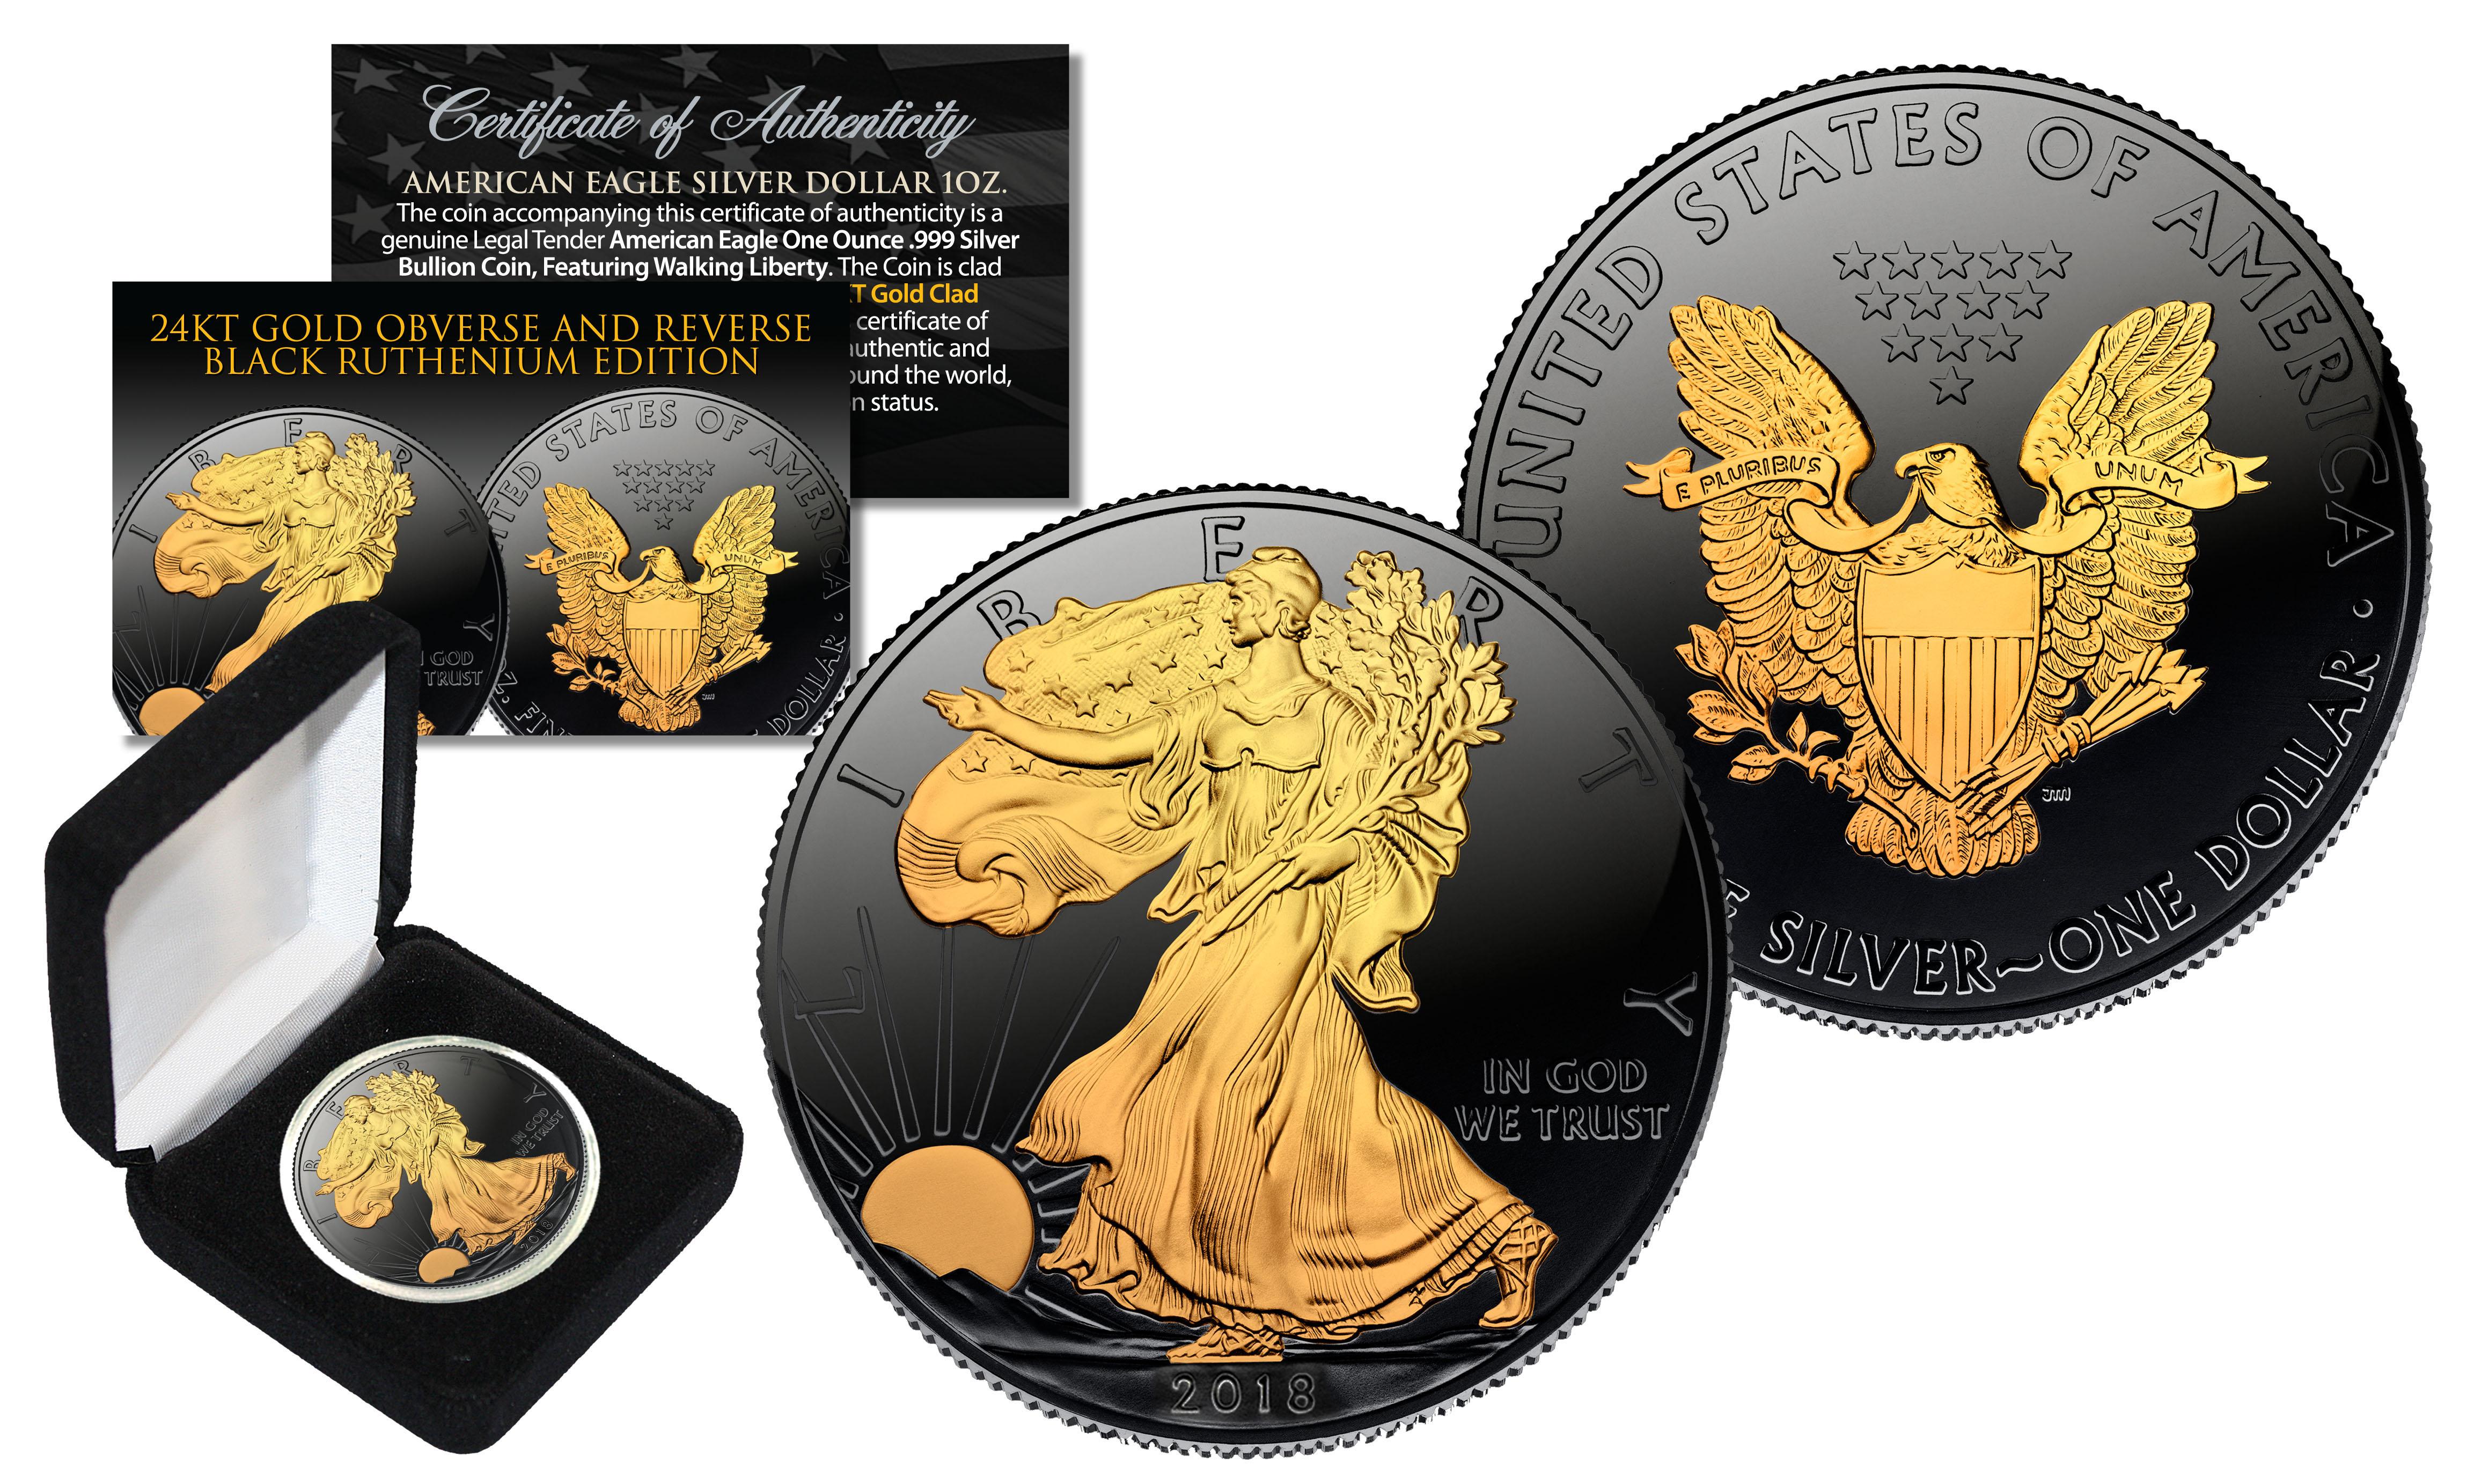 2019 1 oz .999 Silver American Eagle US Coin 24K Gold Gilded w// Black Ruthenium